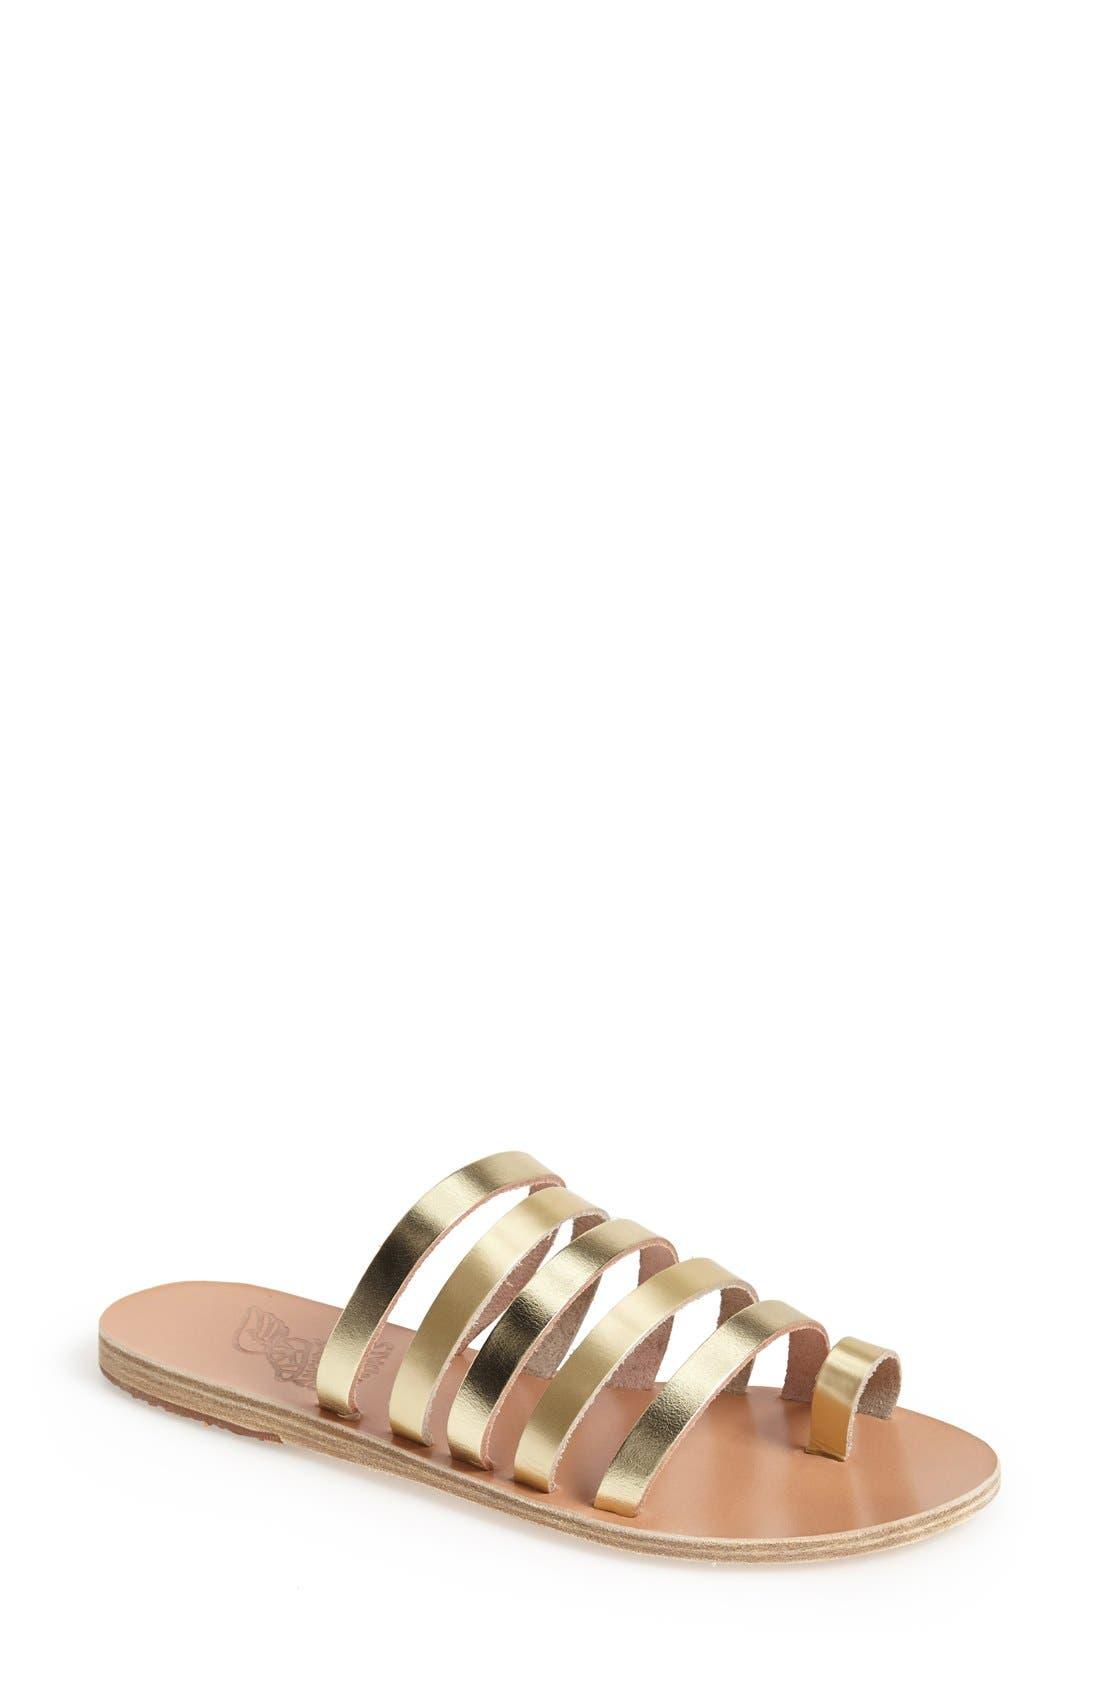 Main Image - Ancient Greek Sandals 'Niki' Leather Sandal (Women)